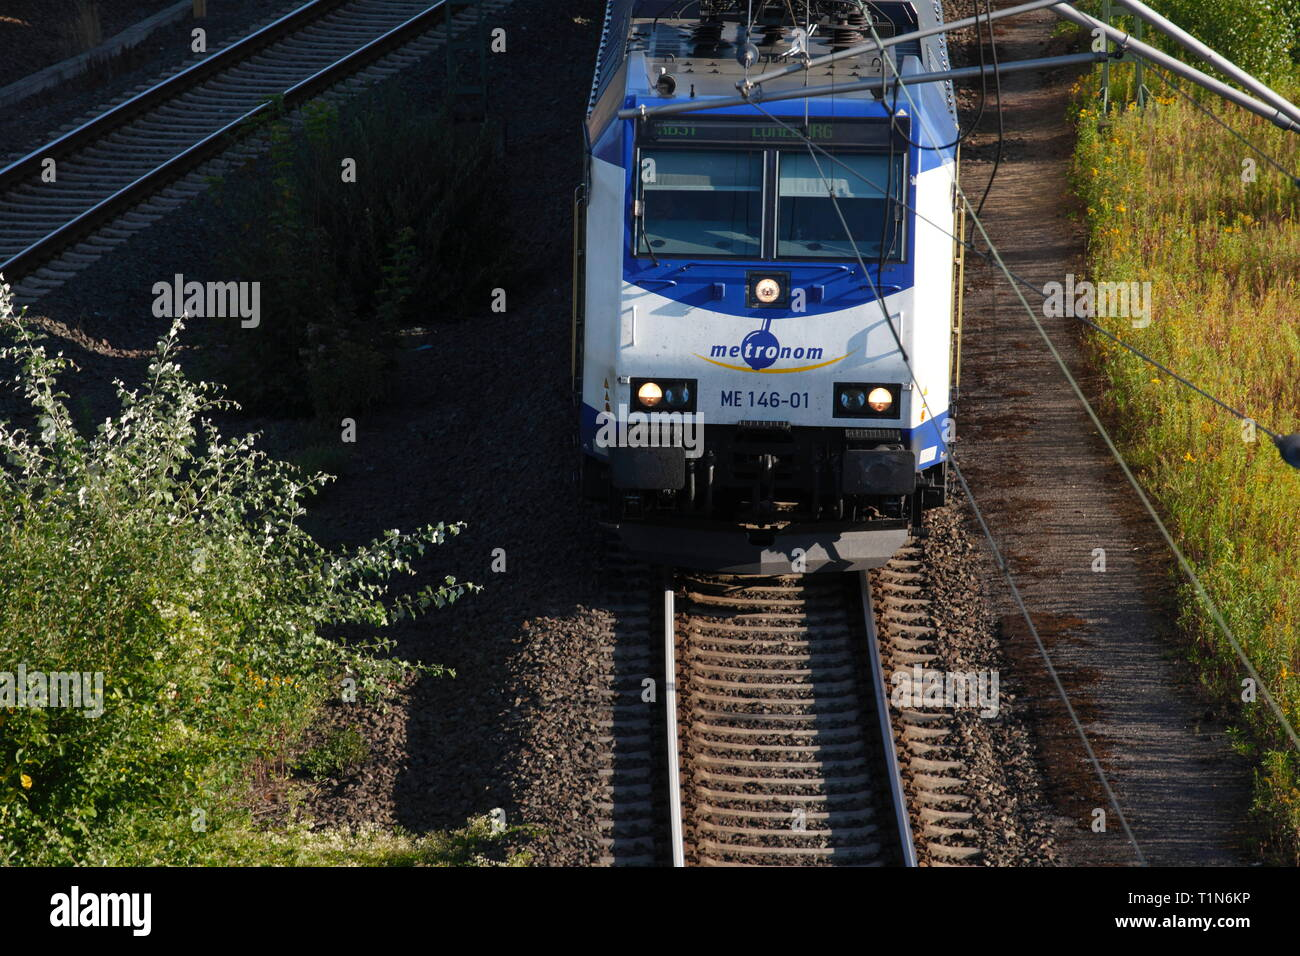 Railway with rails and commuter train Metronom, Harburg, Hamburg, Germany, Europe I Bahnanlage mit Schienen und Nahverkehrszug Metronom, Harburg, Hamb - Stock Image